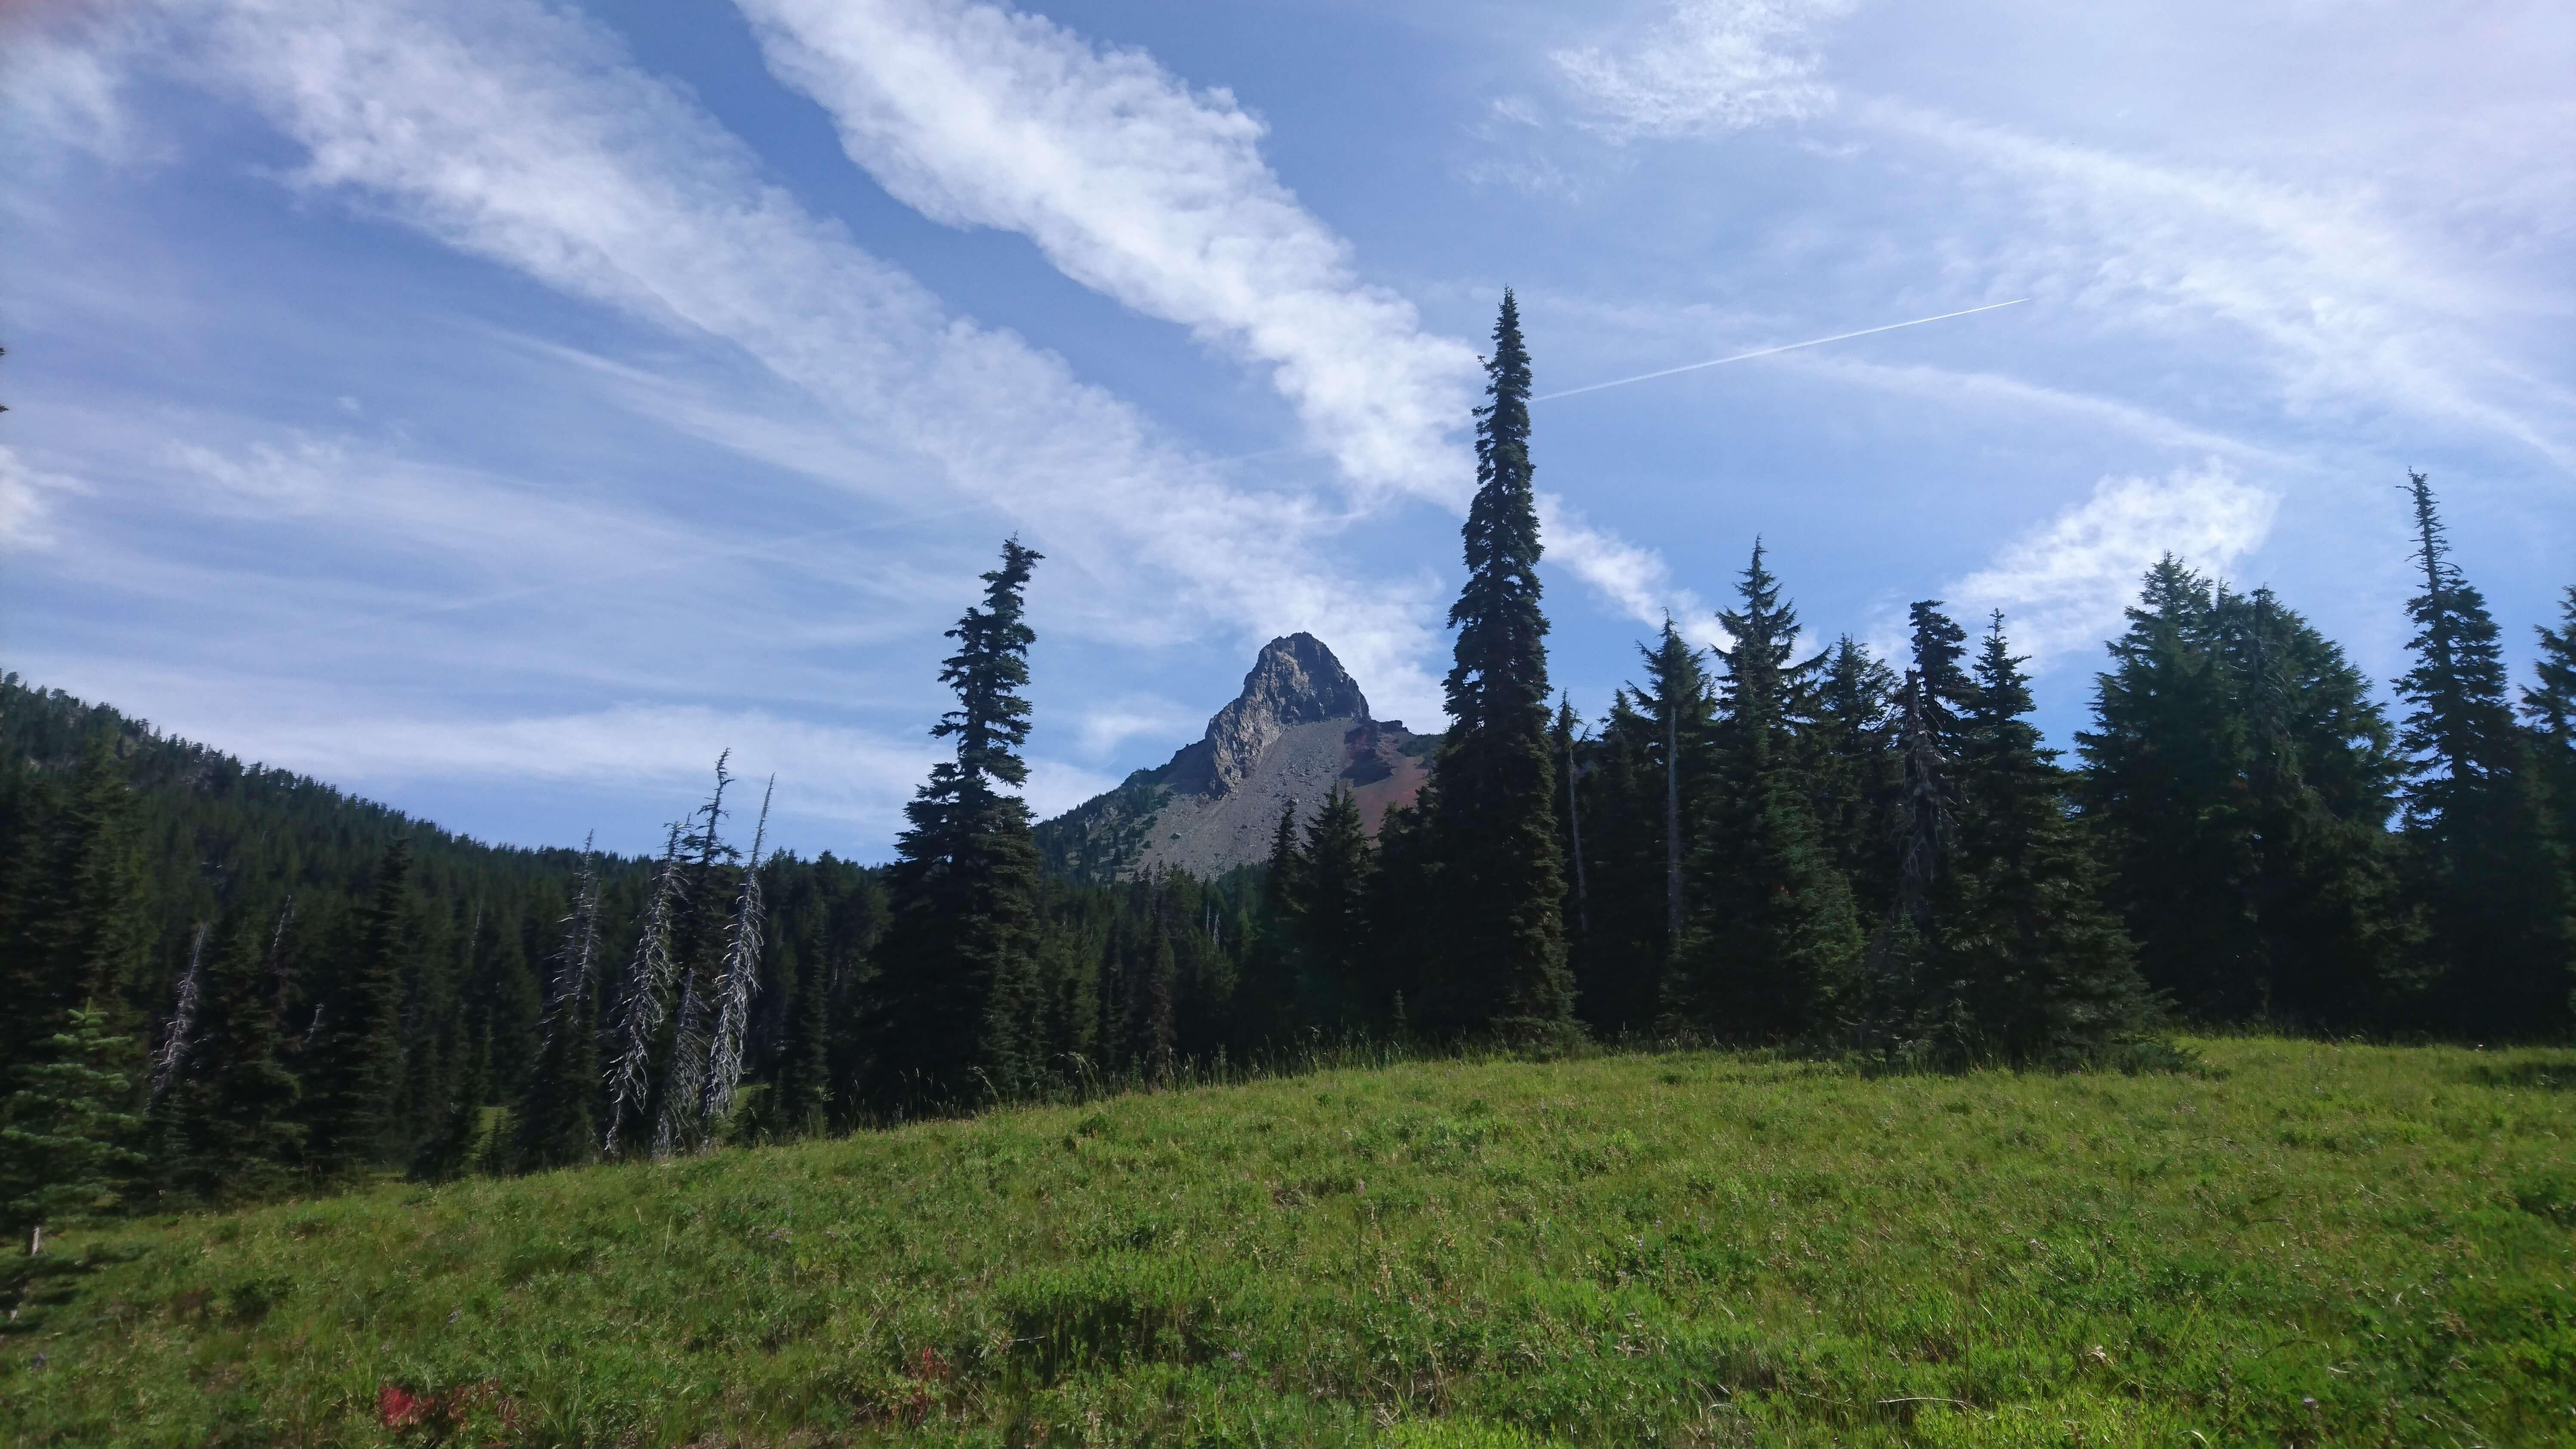 Le Mont Washington